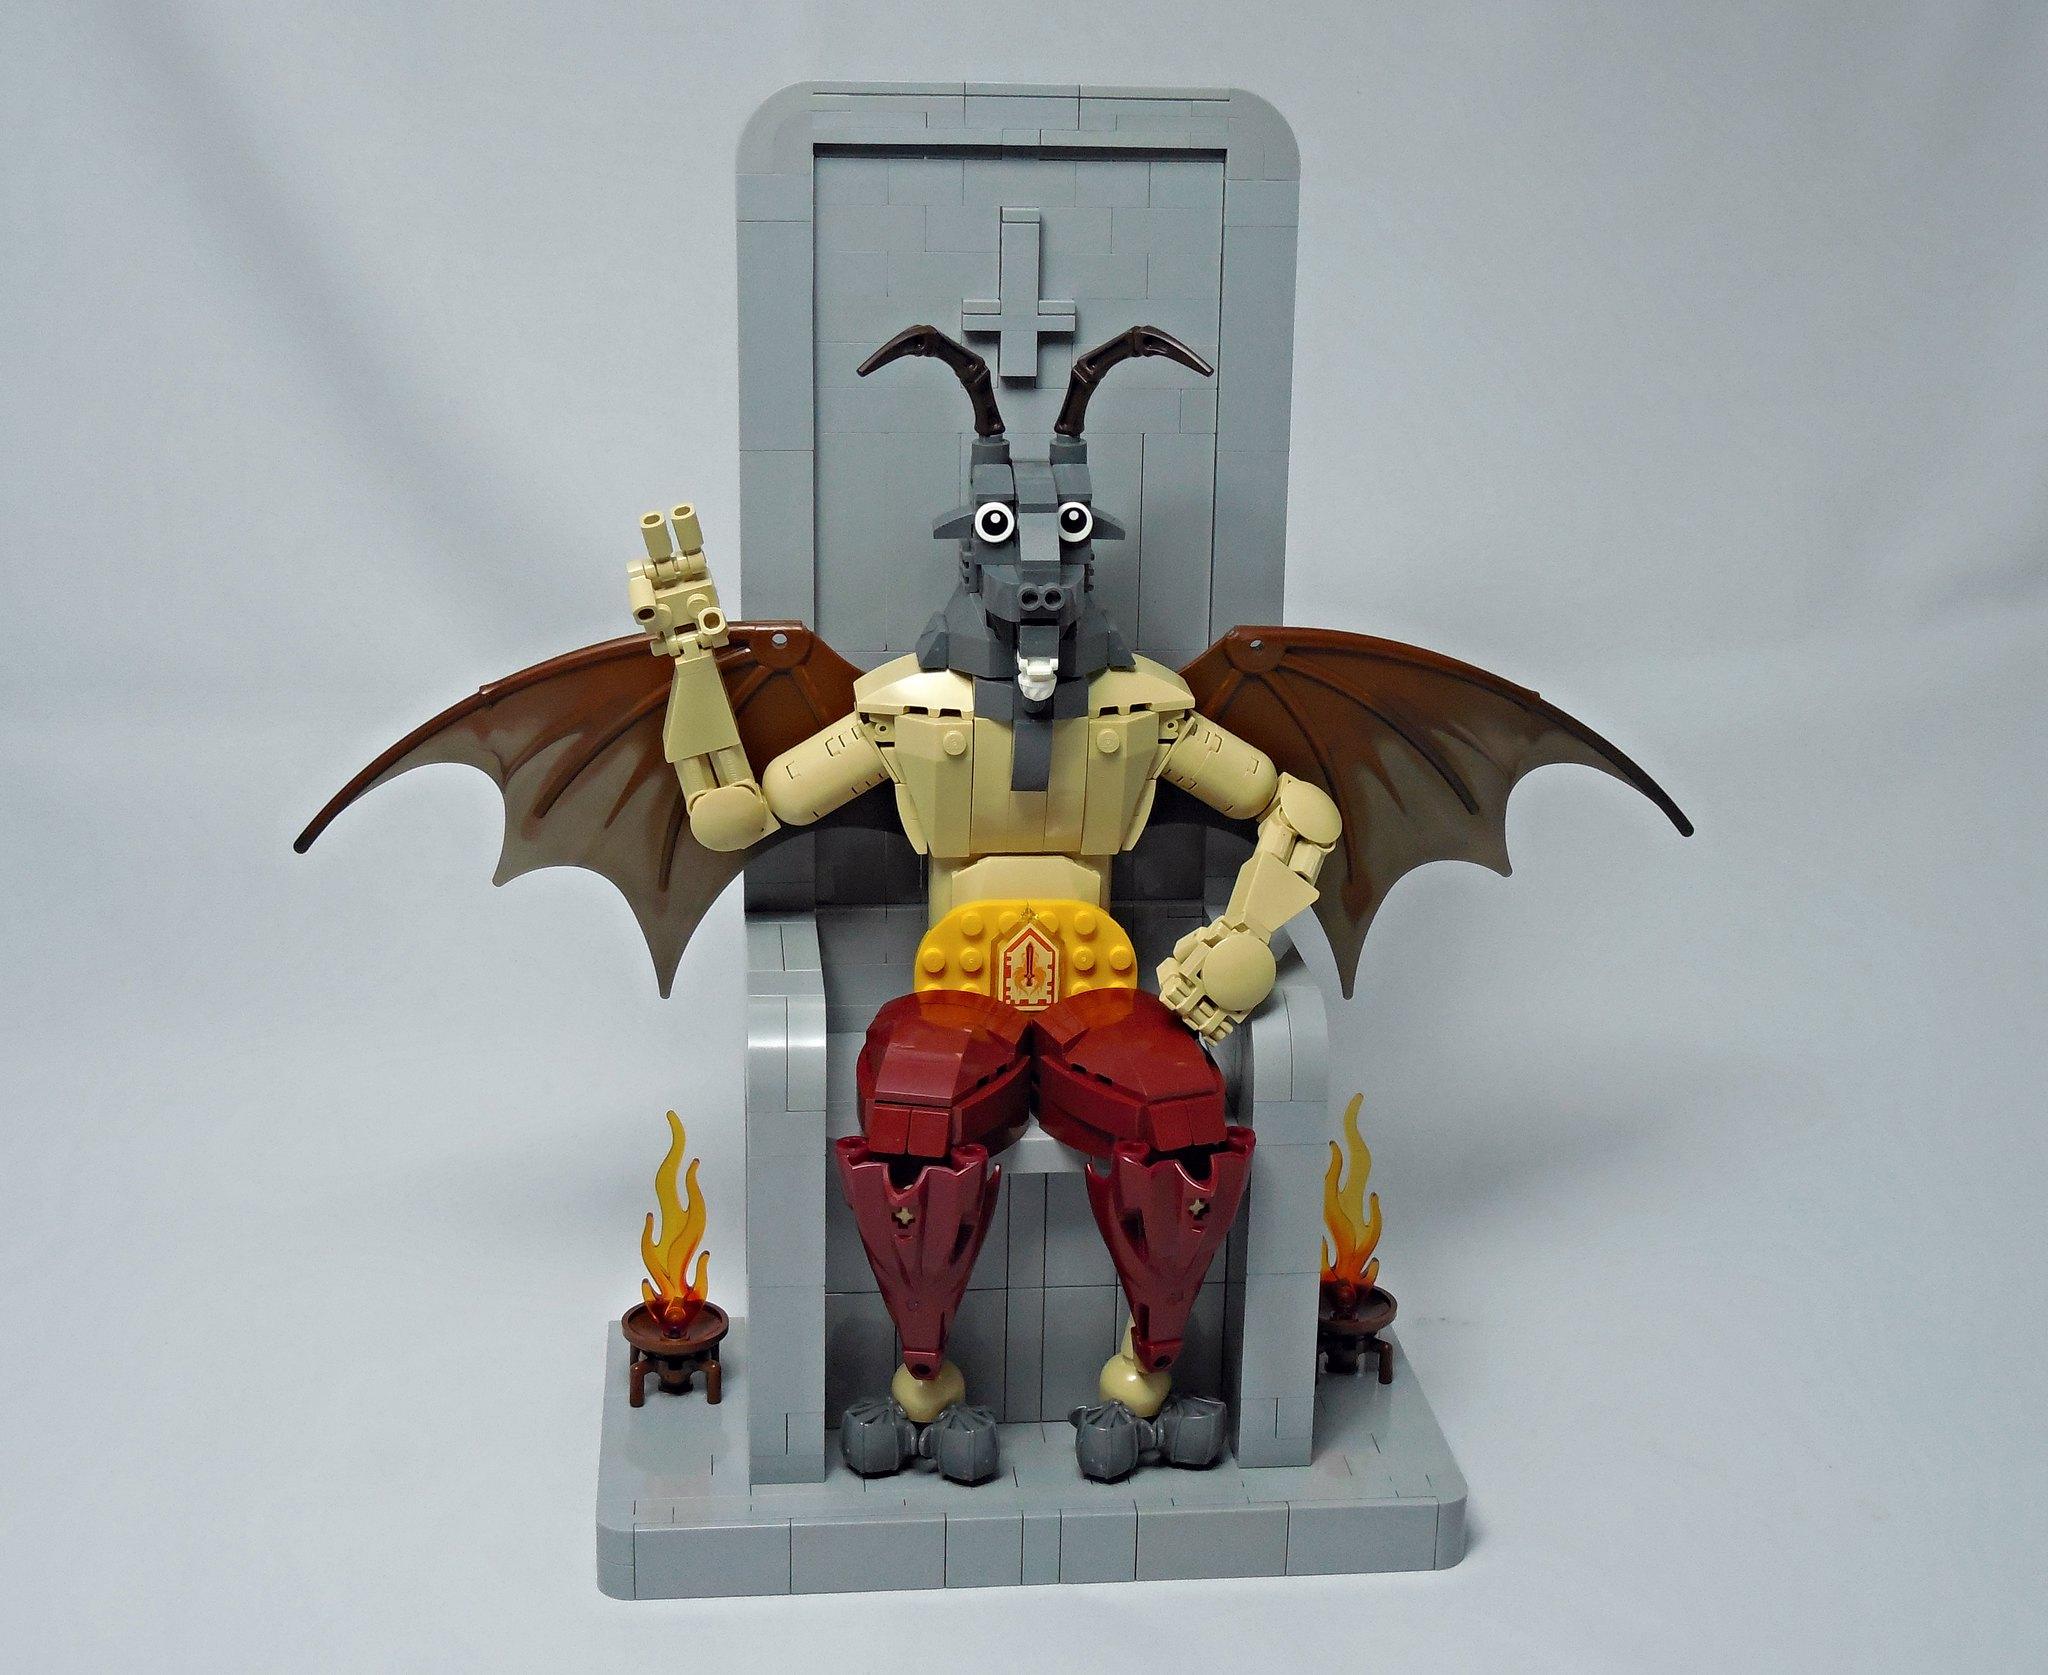 LEGO® MOC by Vitreolum: Baphomet